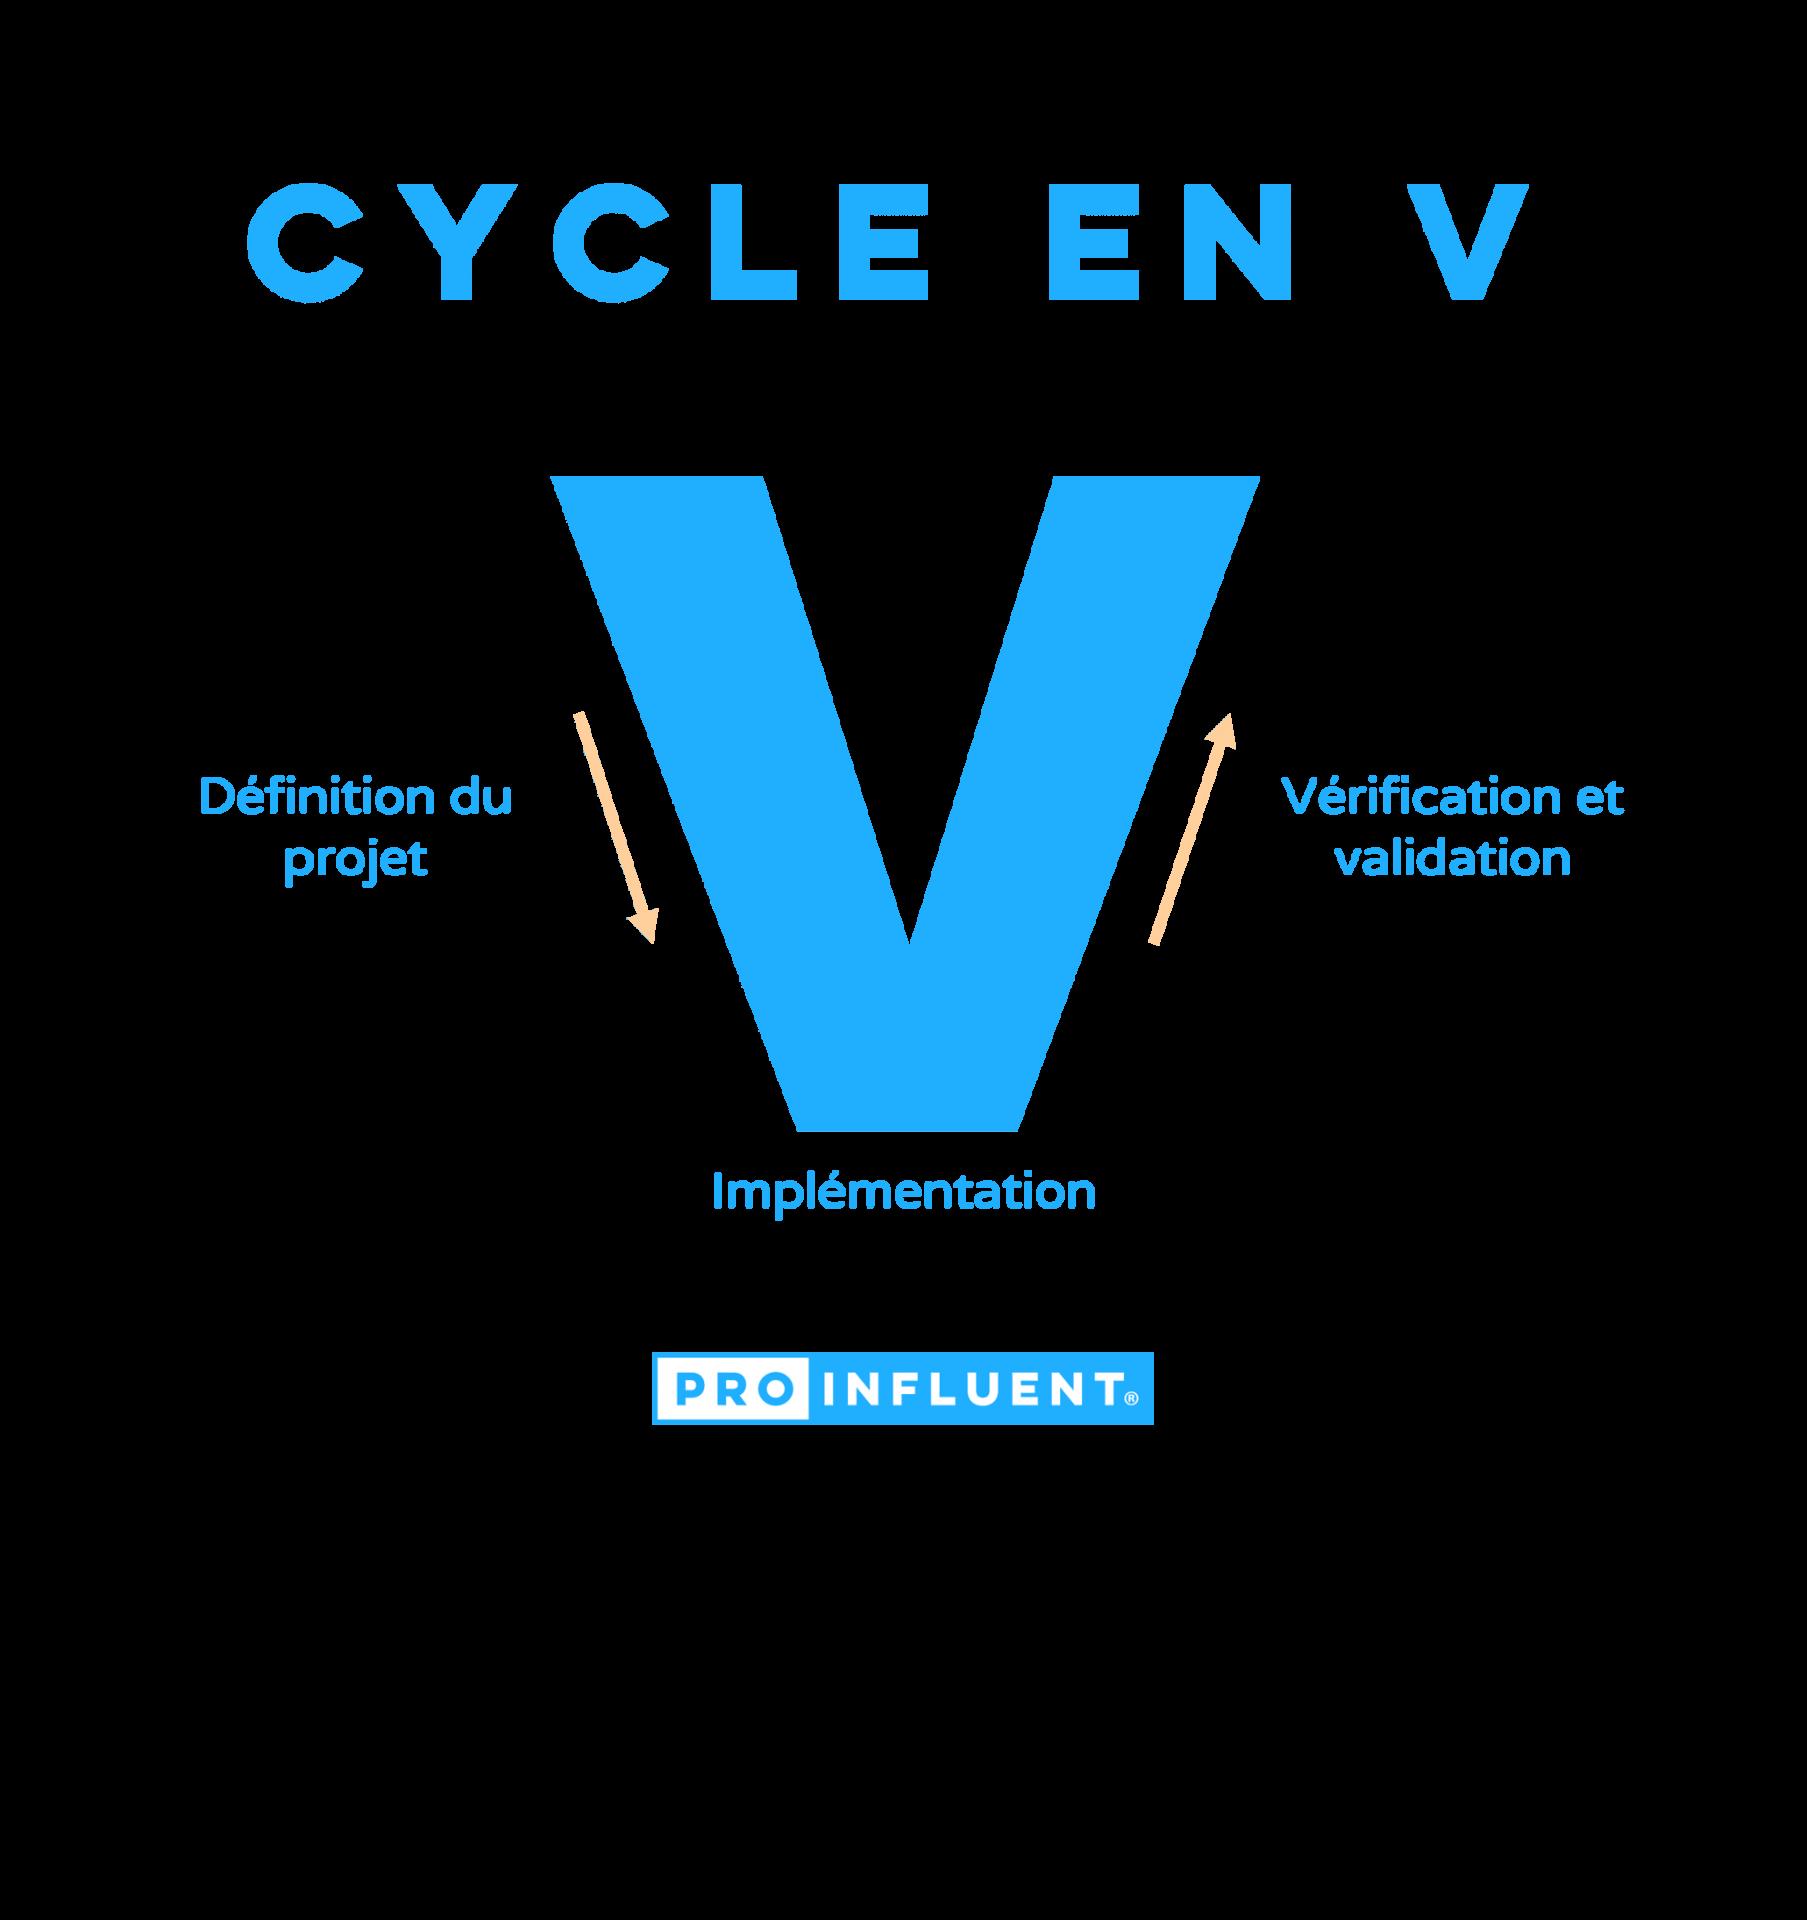 Définition du cycle en V